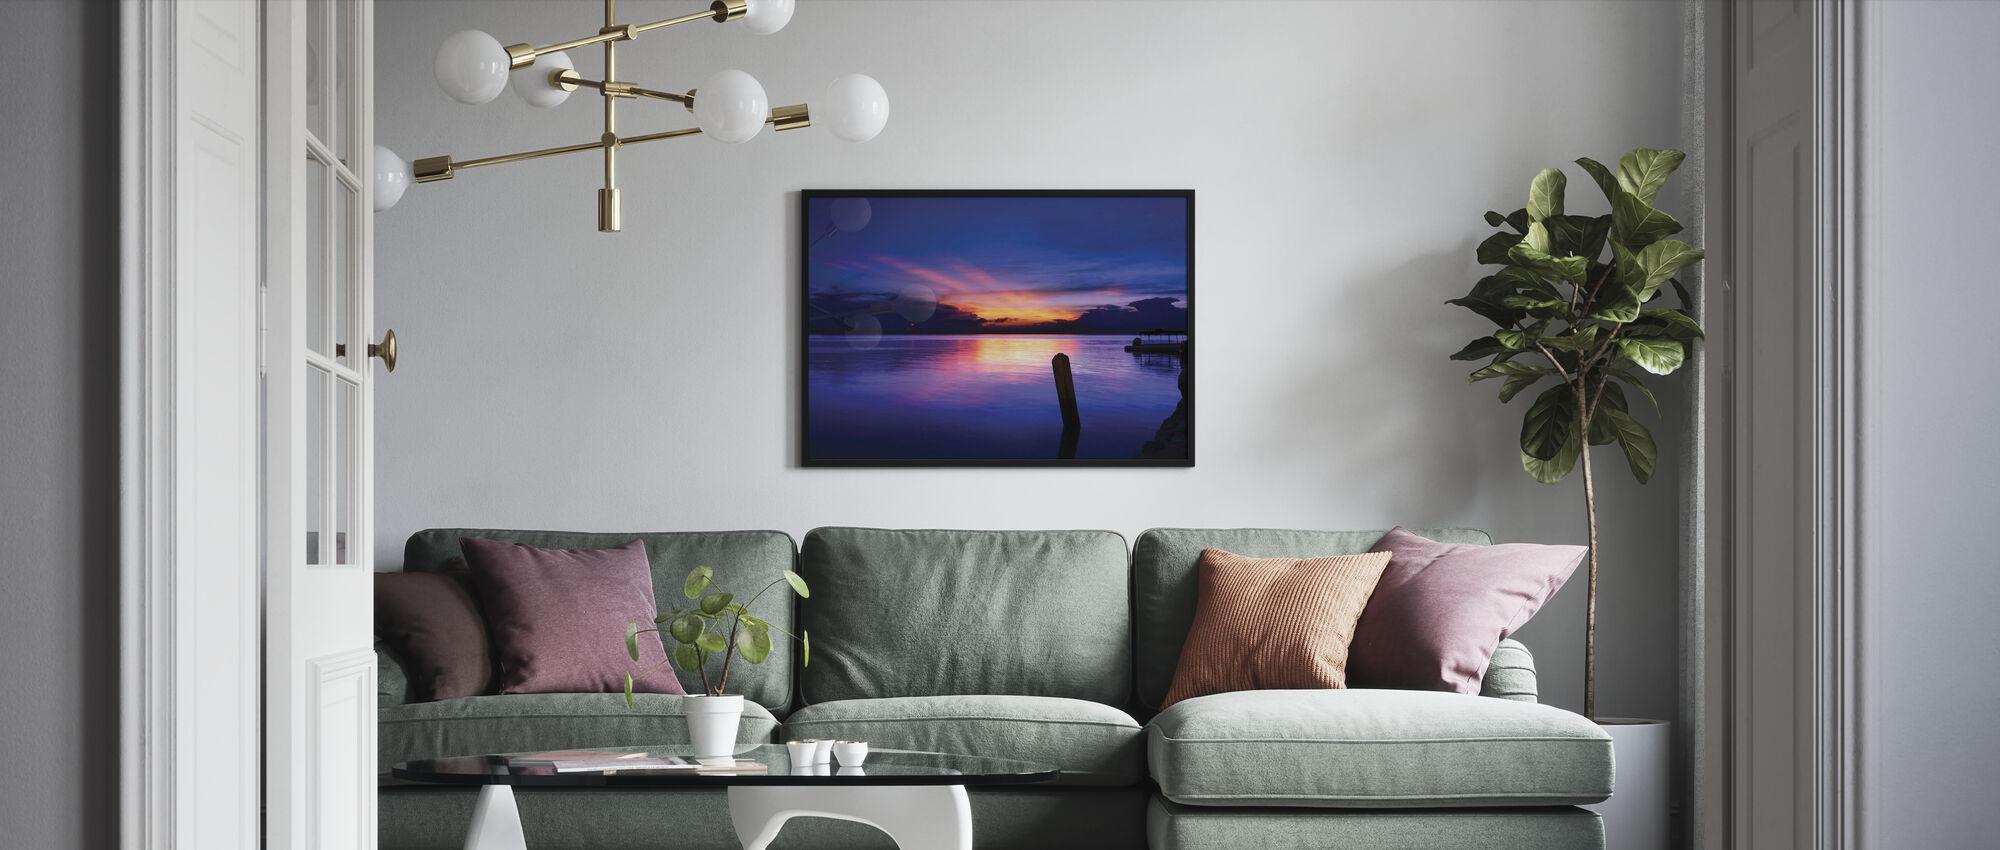 Sunrise at Sta Ana - Poster - Living Room